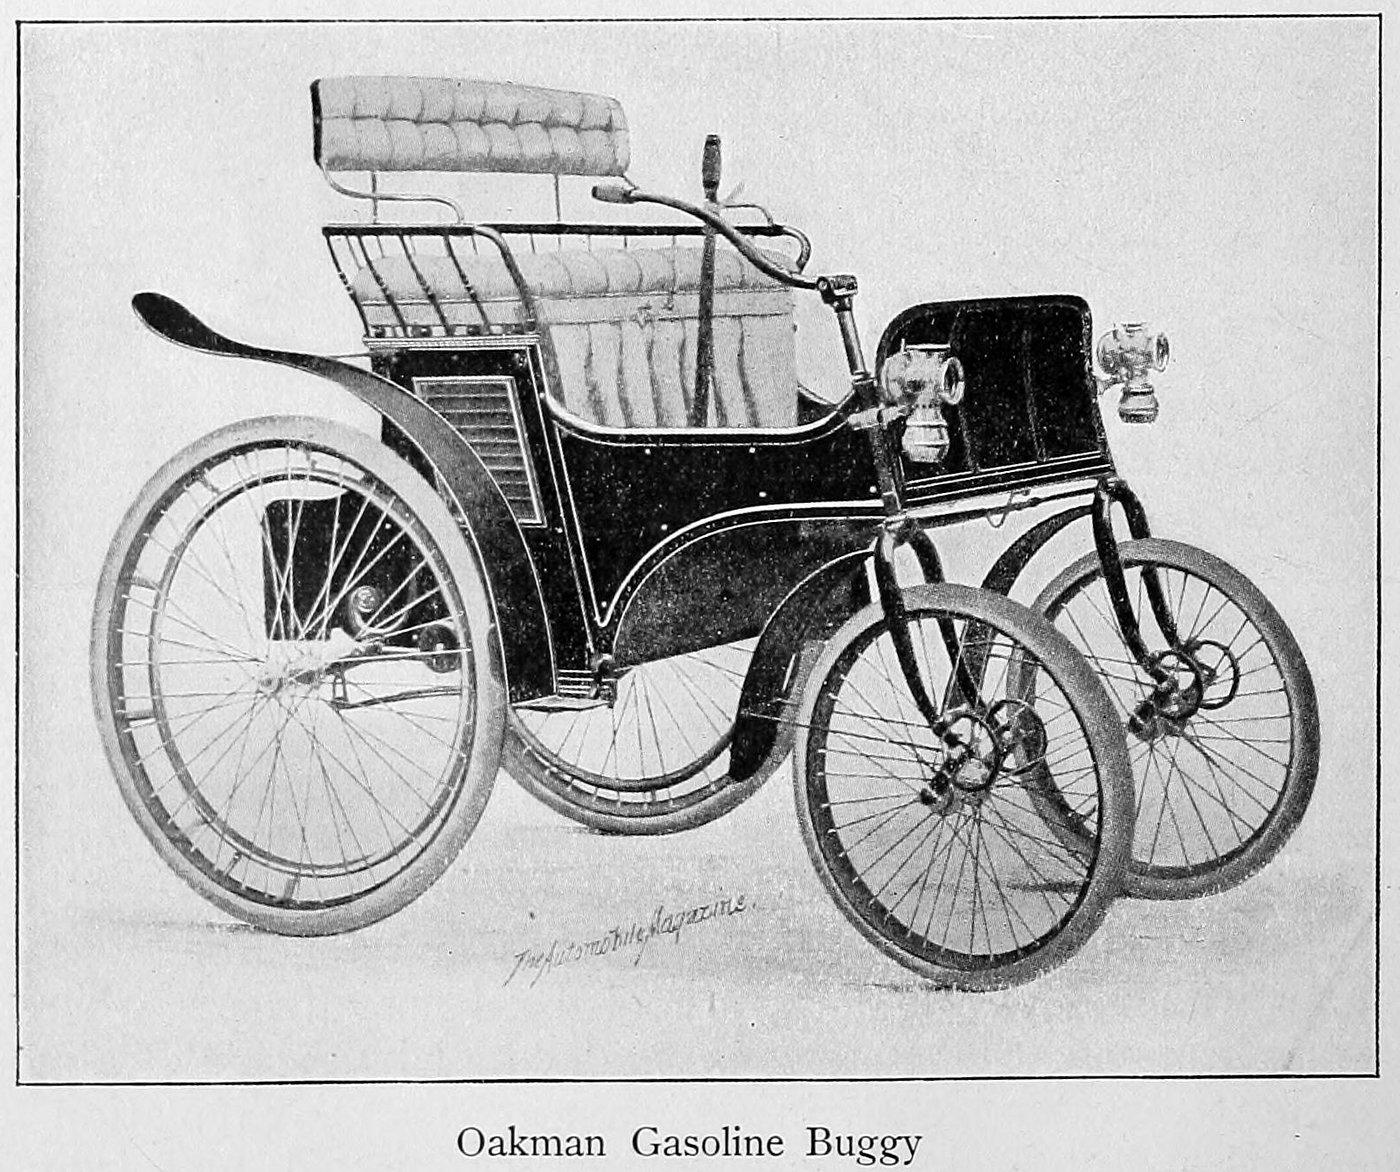 Oakman gasoline buggy (1900)